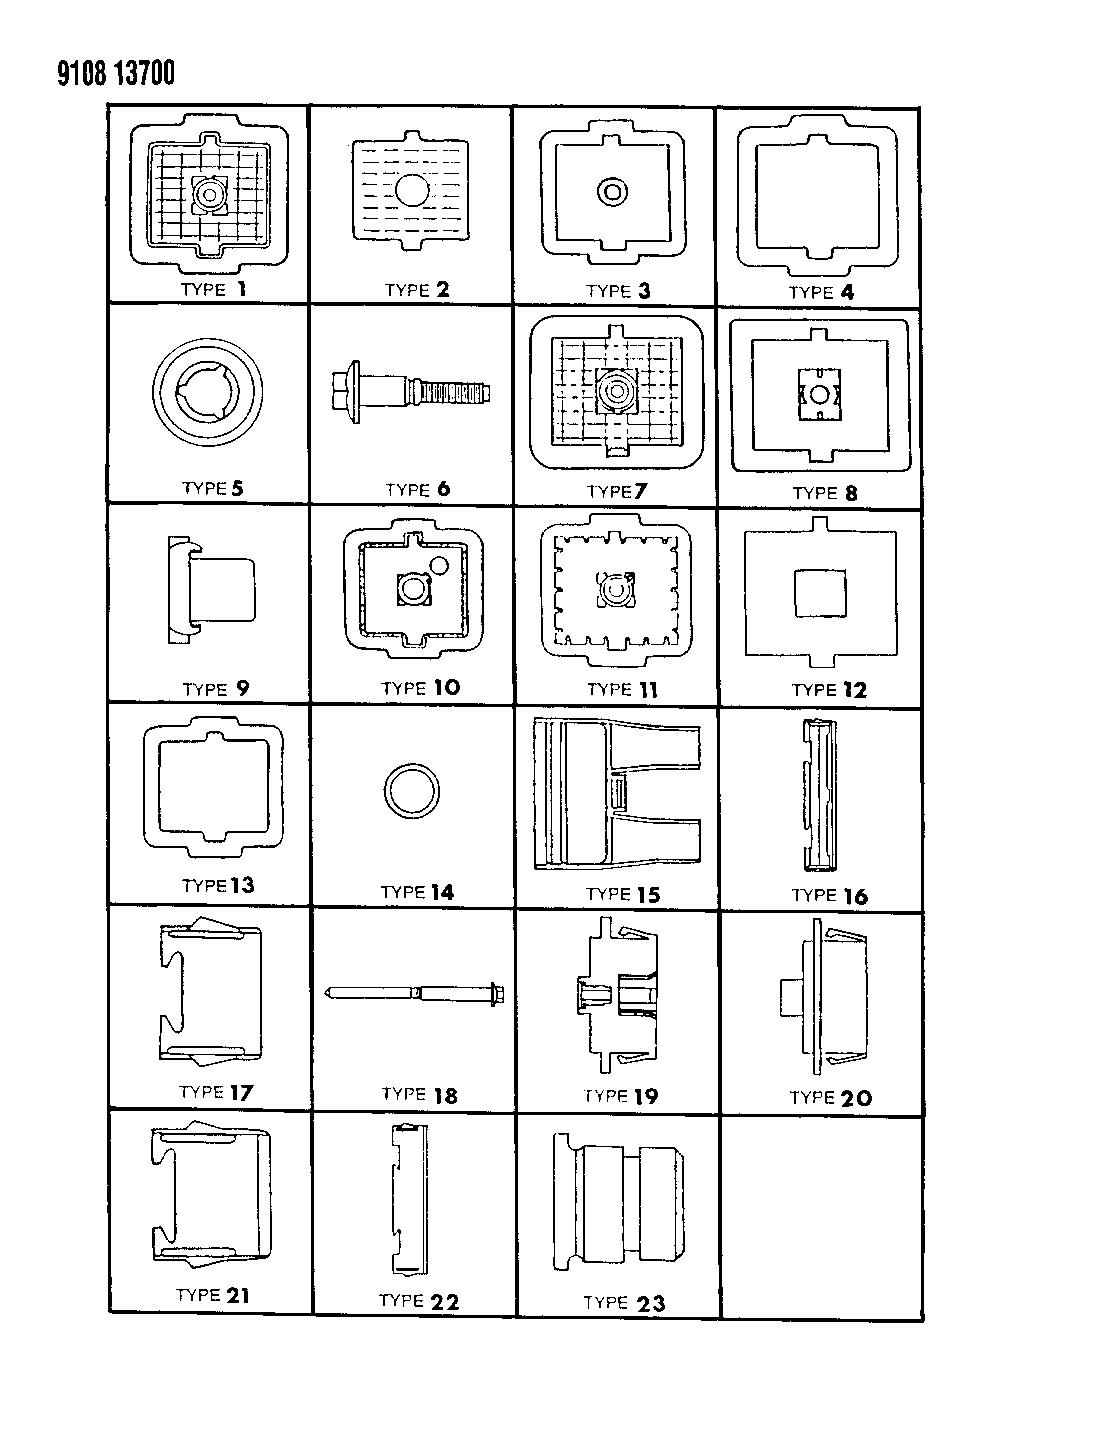 1989 Dodge Omni Bulkhead Connectors Components Wiring Harness